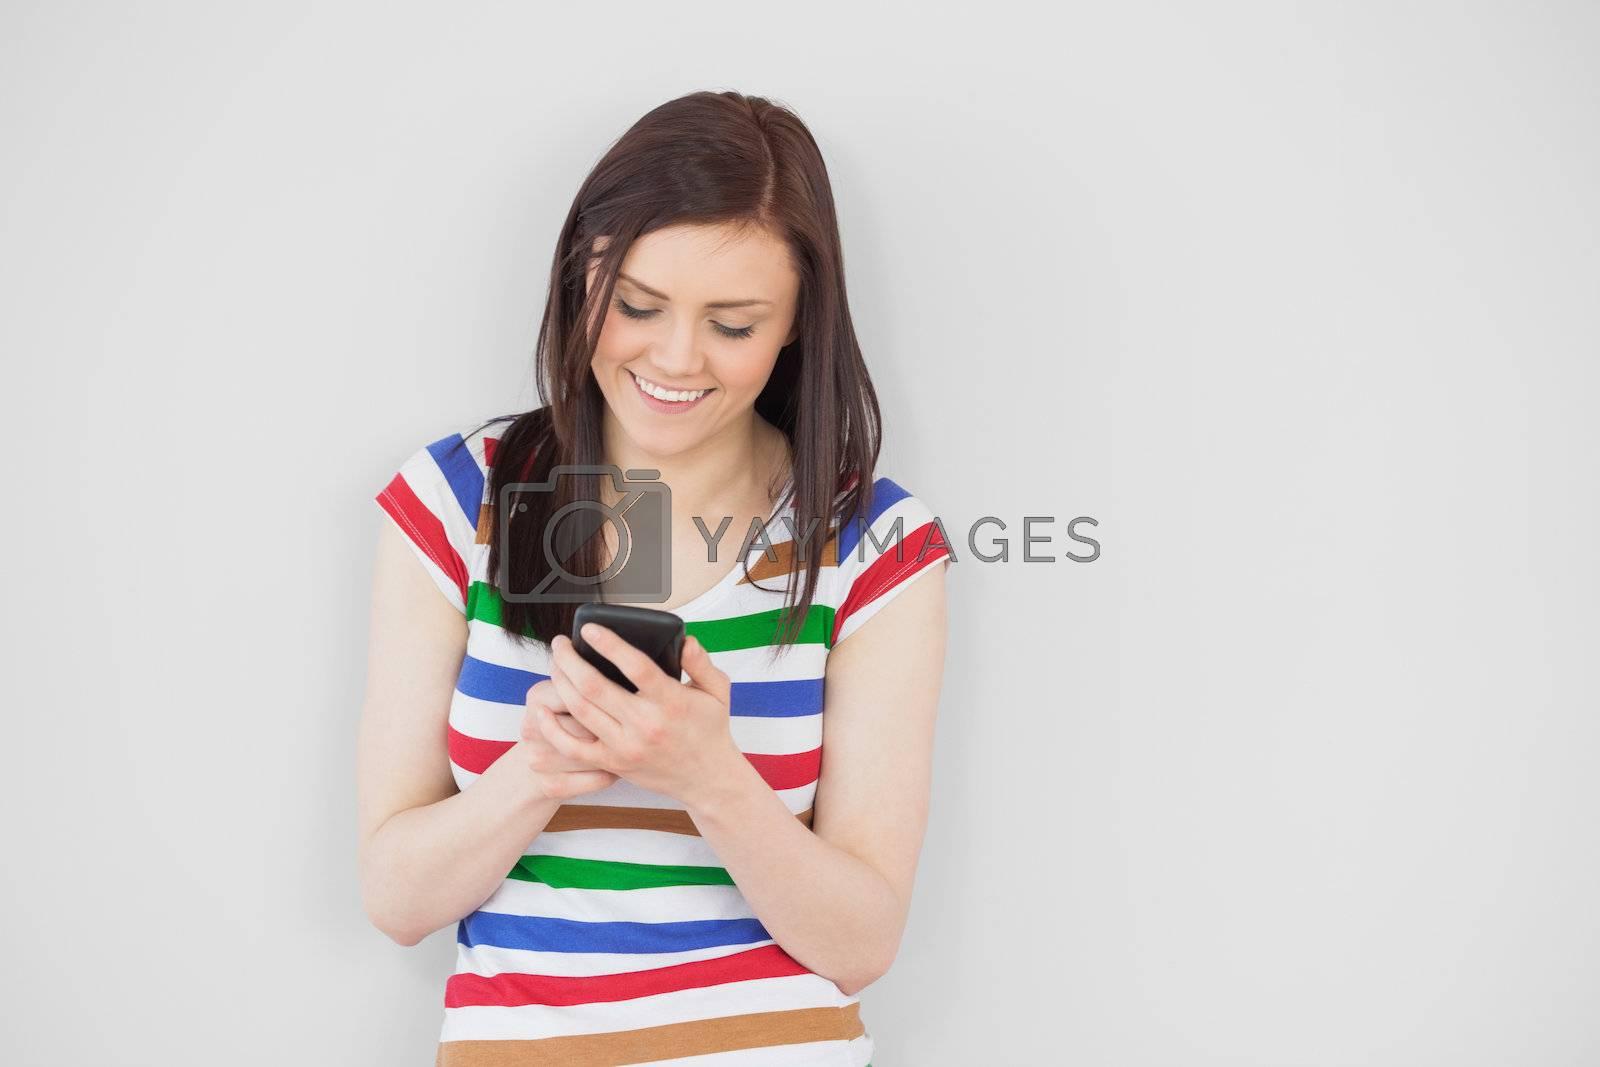 Smiling girl using her mobile phone by Wavebreakmedia